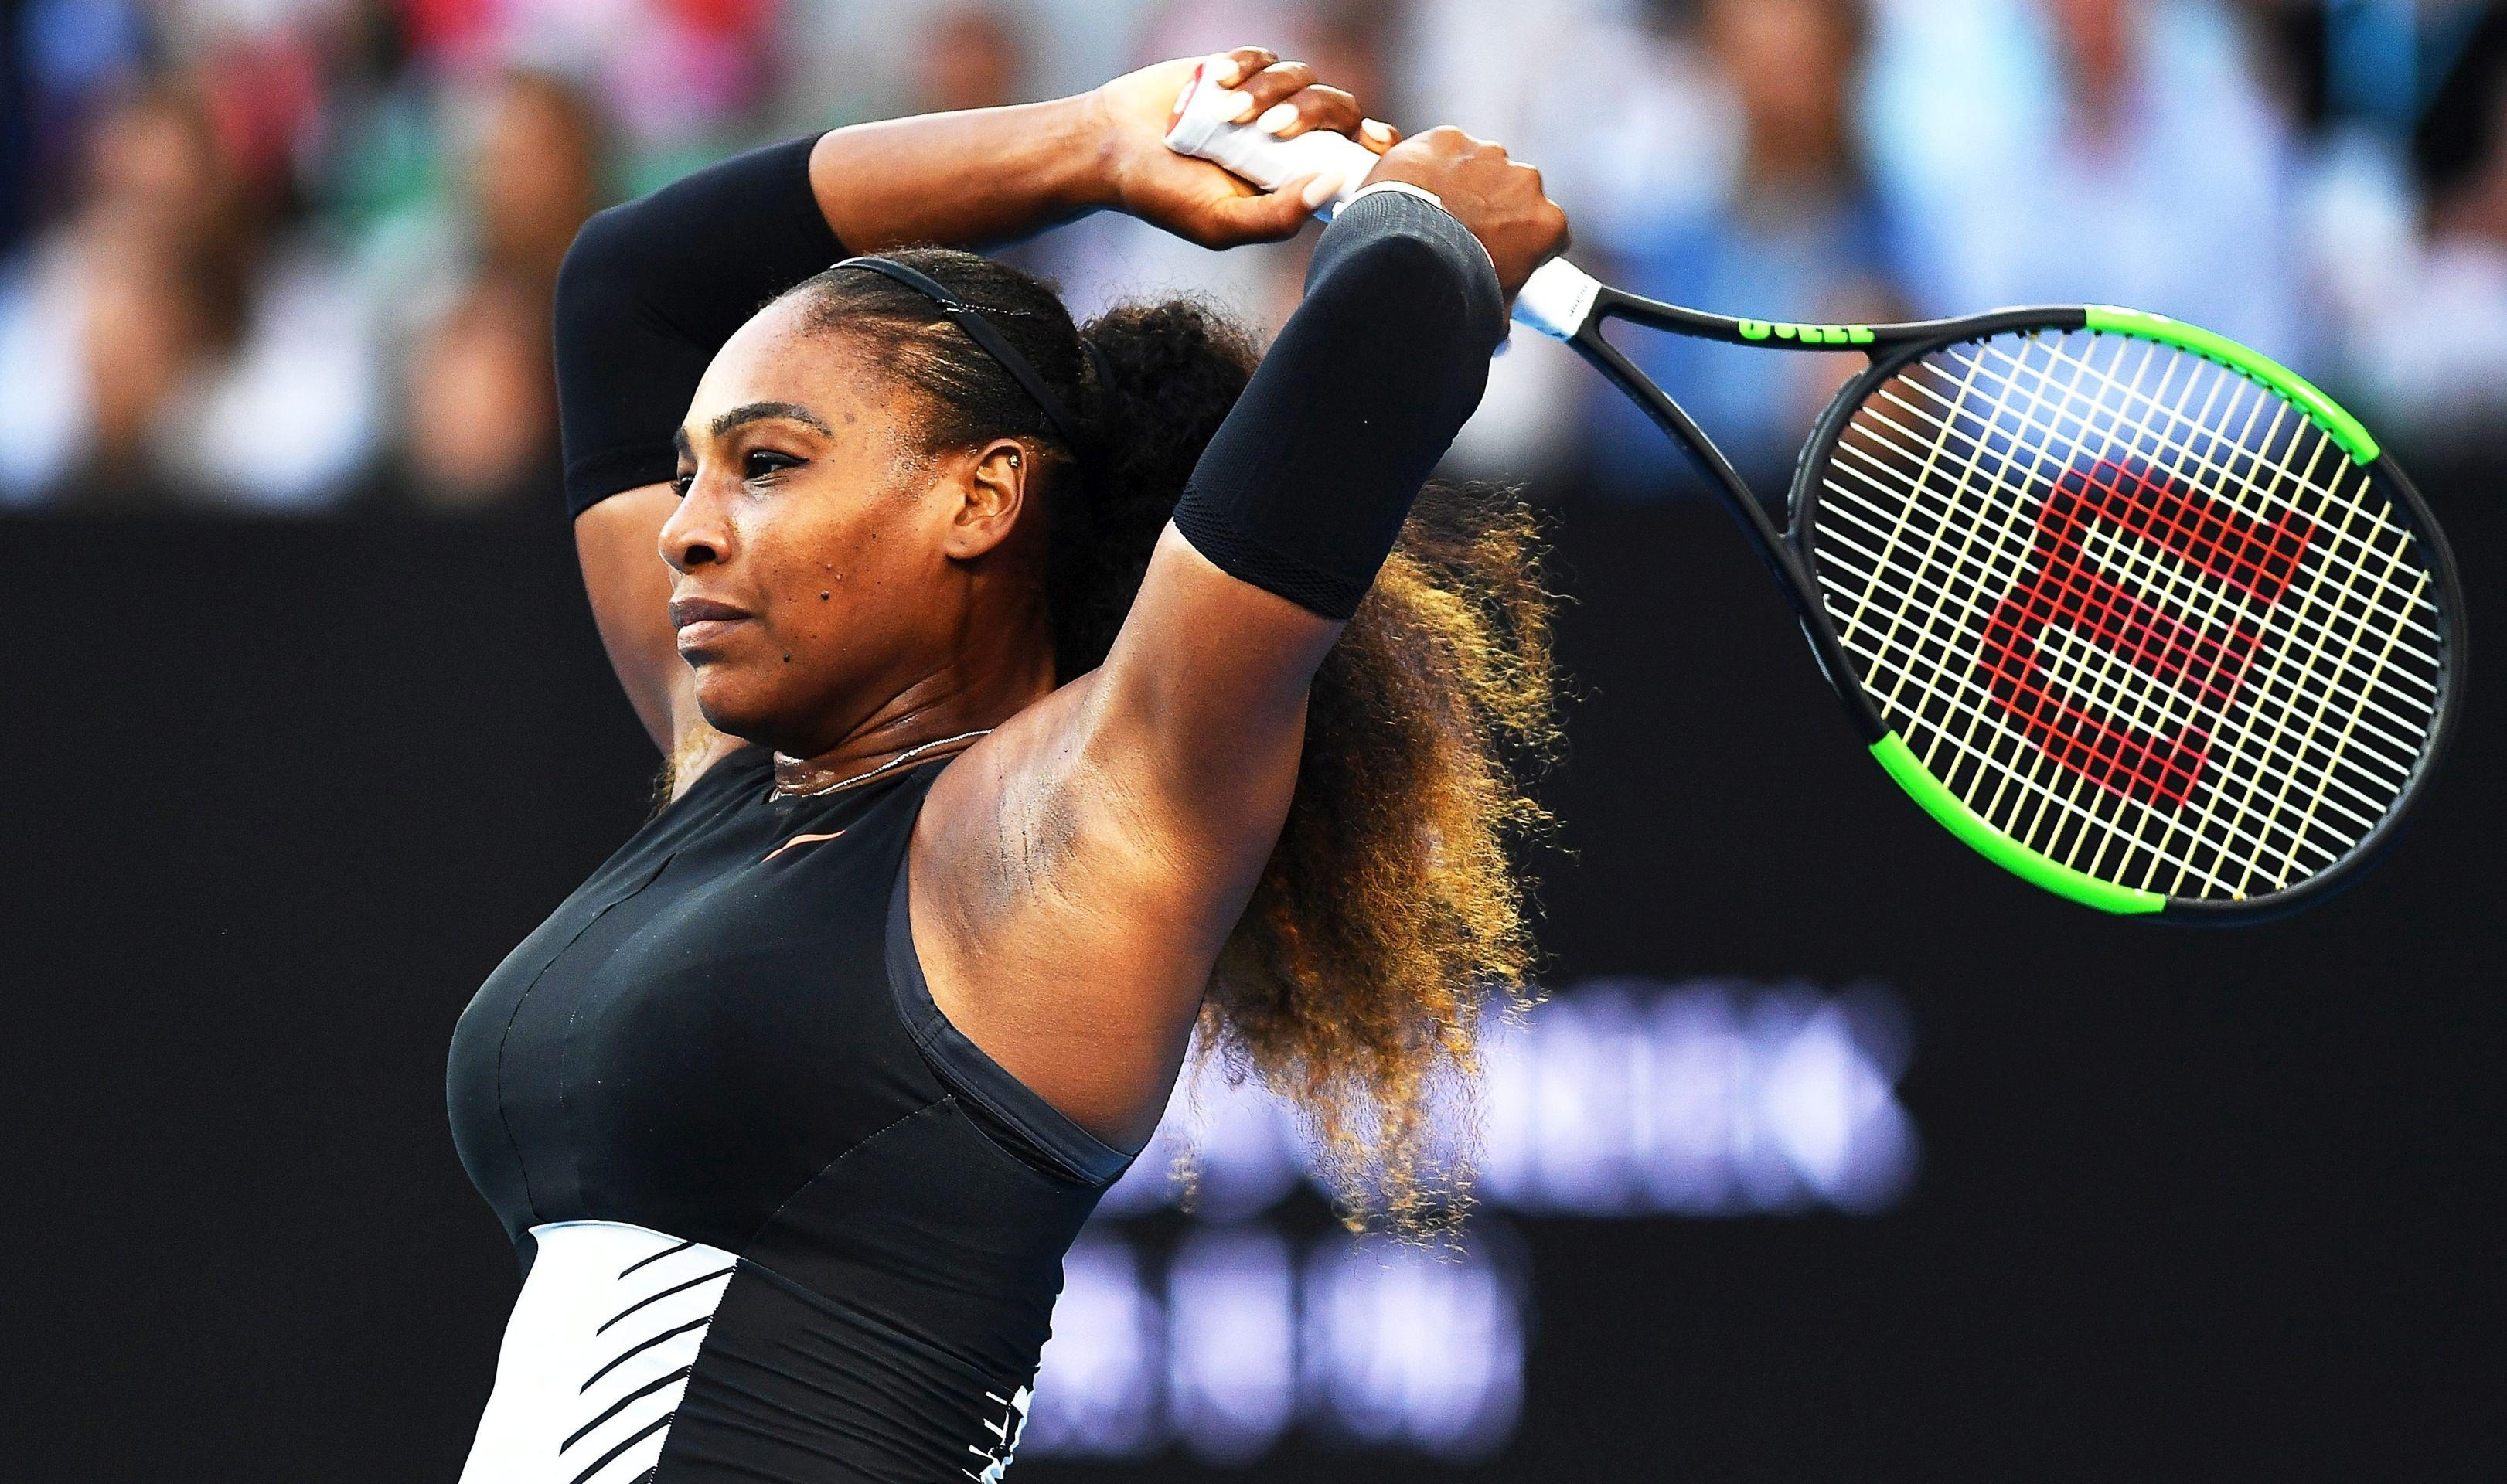 Serena Williams odustala od nastupa u Indian Wellsu i Miami